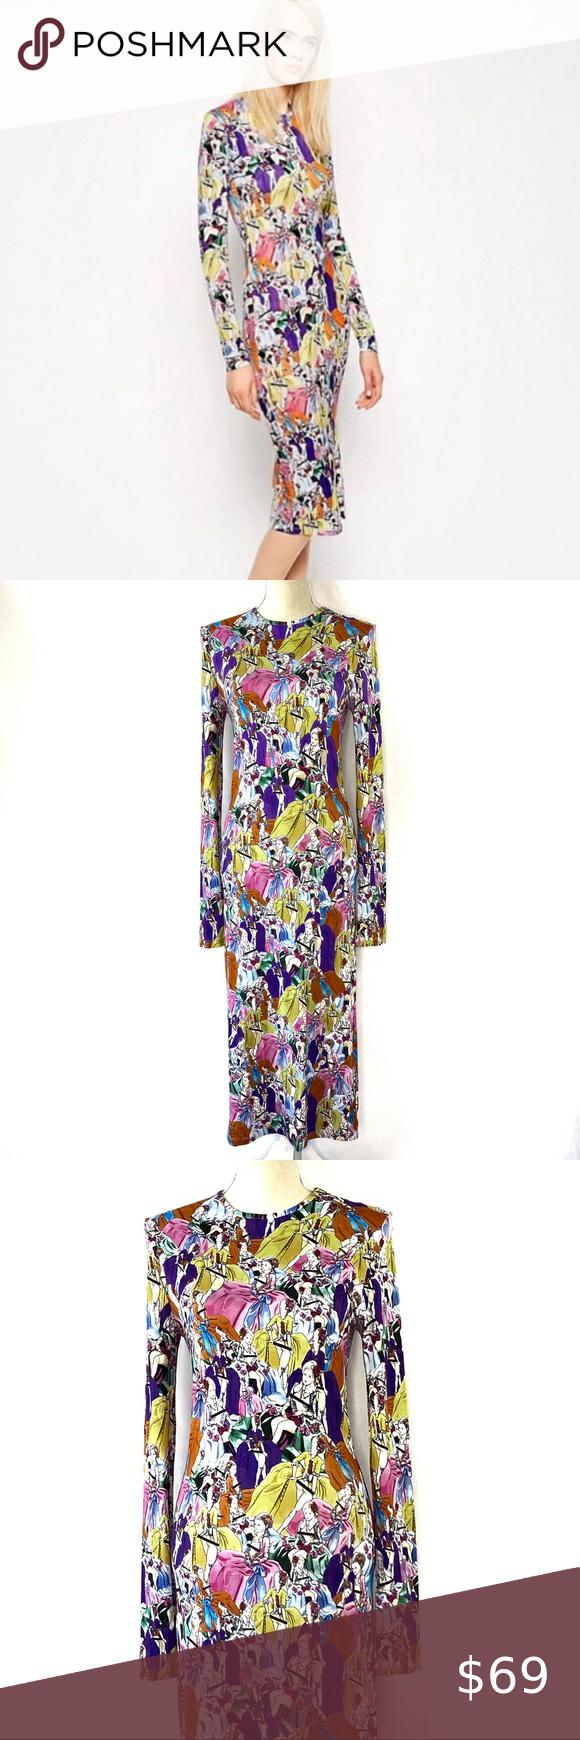 Risque Dress House Of Holland Size 8 House Dress Long Sleeve Midi Dress Girls Dresses Size 8 [ 1740 x 580 Pixel ]